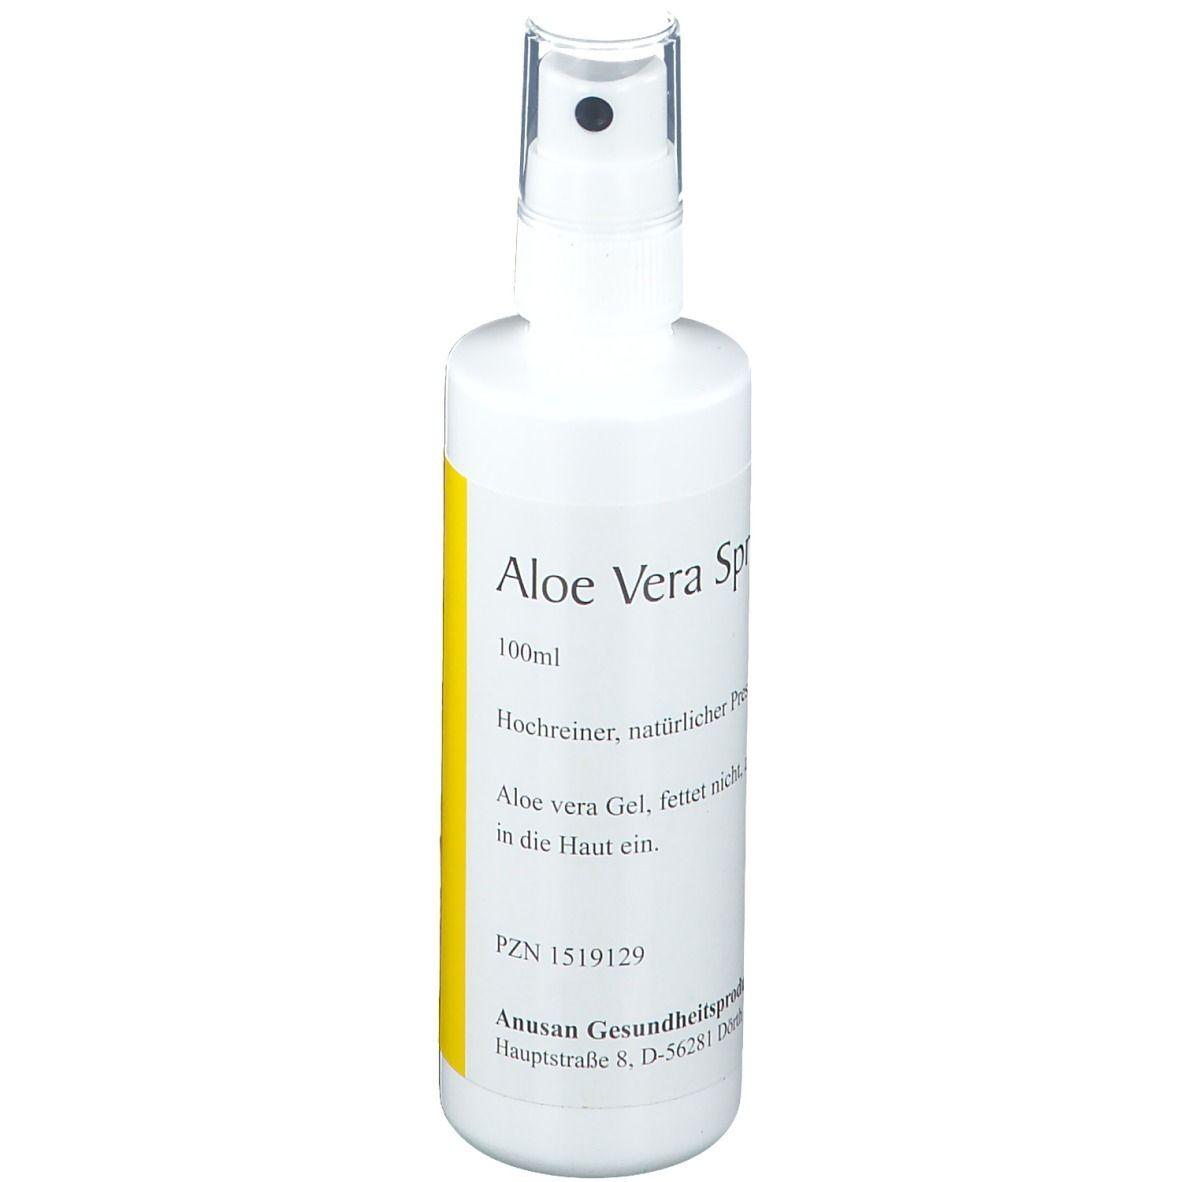 Image of Aloe Vera Spray